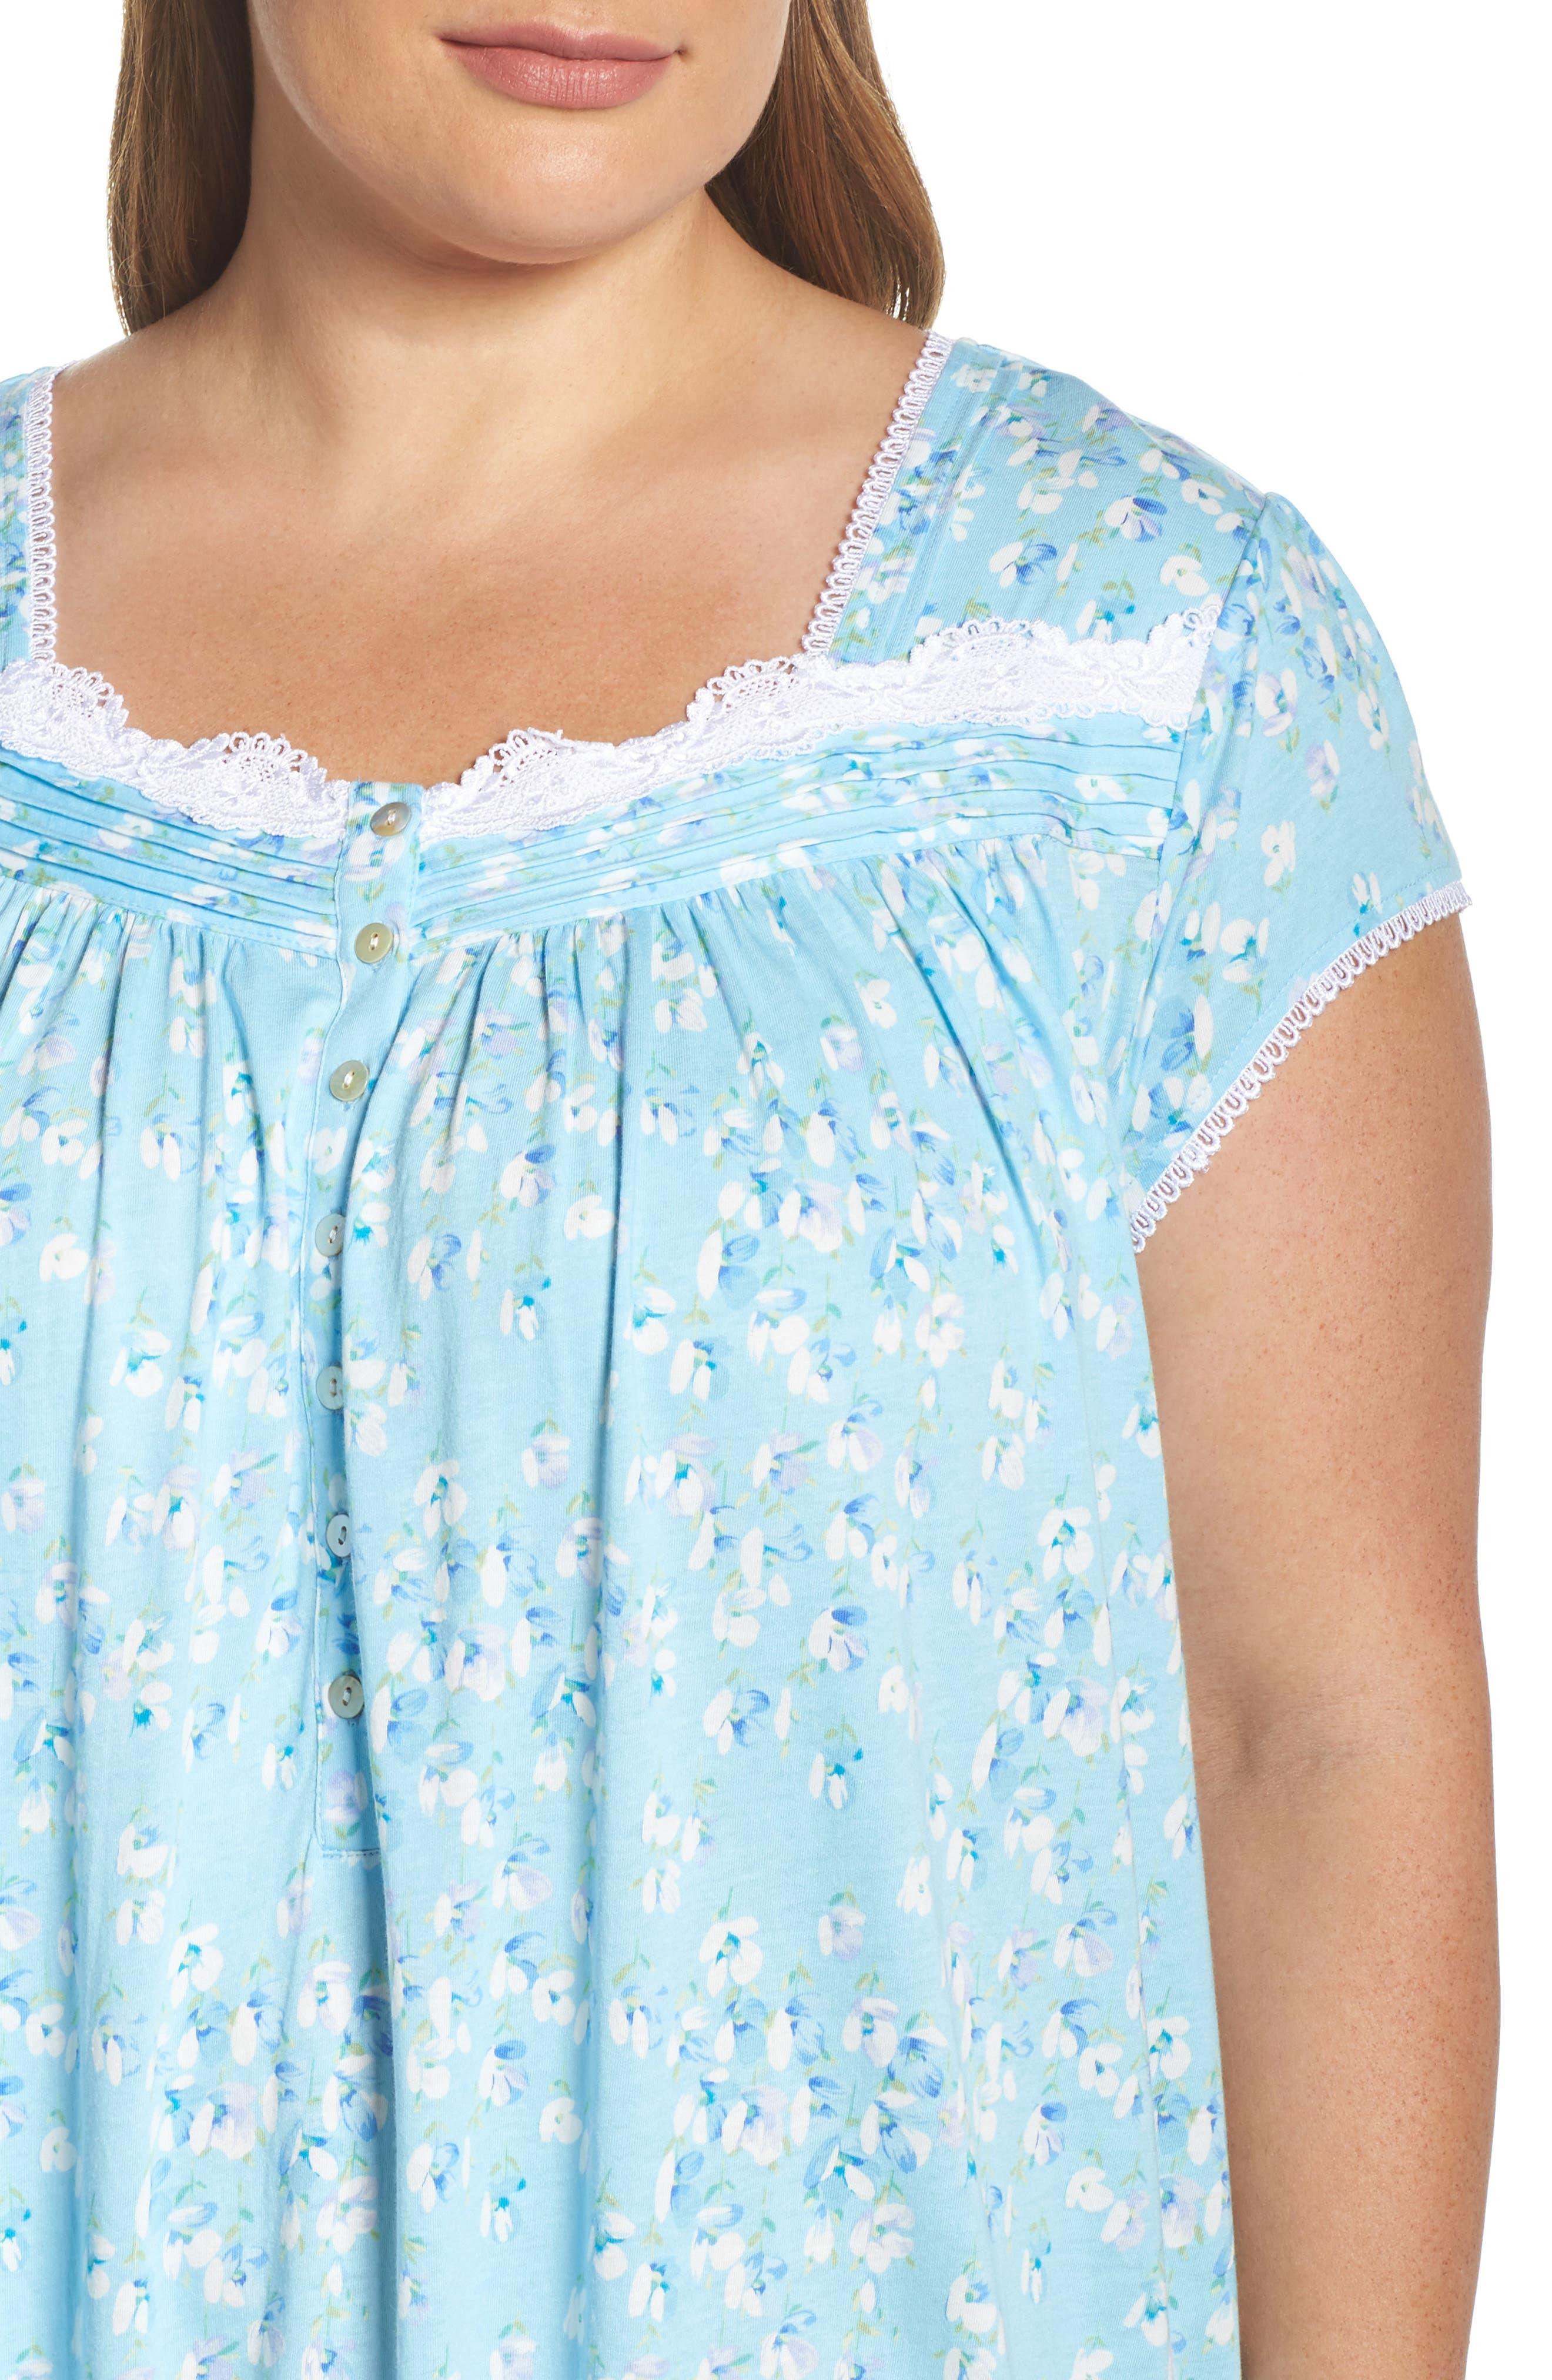 Waltz Nightgown,                             Alternate thumbnail 5, color,                             Light Sea Glass/ Multi Floral